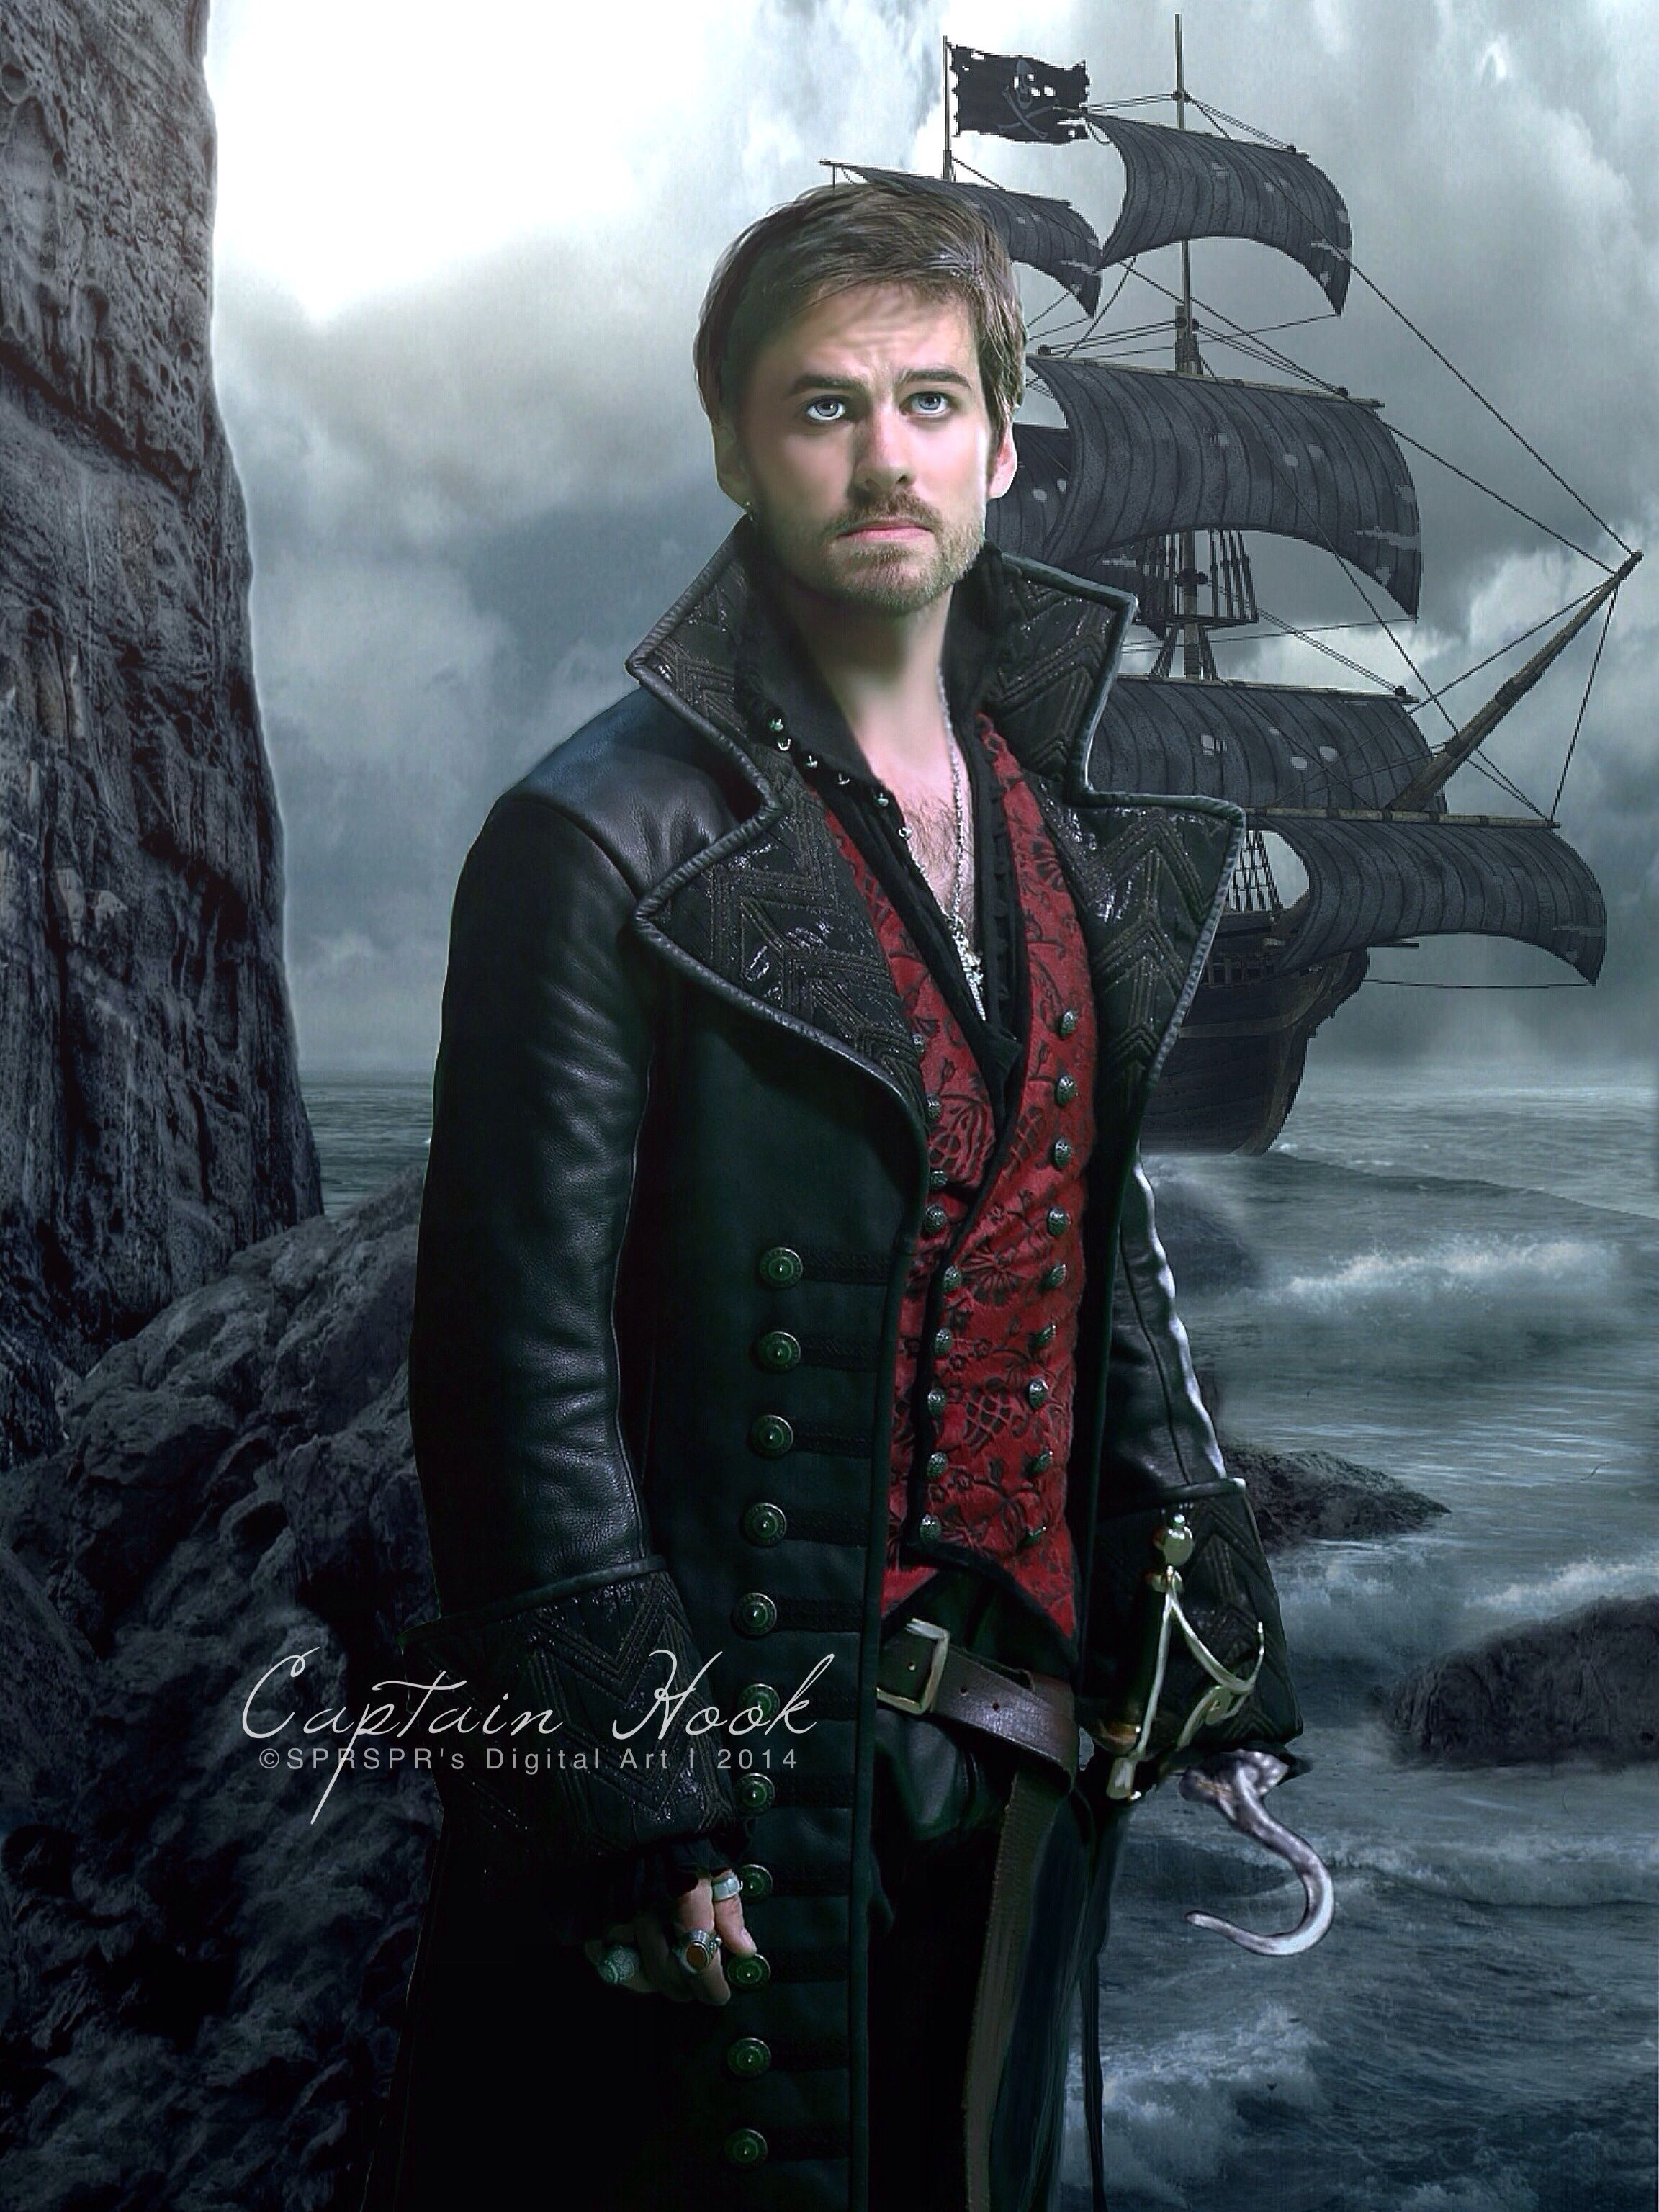 f66369b6e Captain Hook ~ Once upon a Time by SPRSPRsDigitalArt.deviantart.com ...